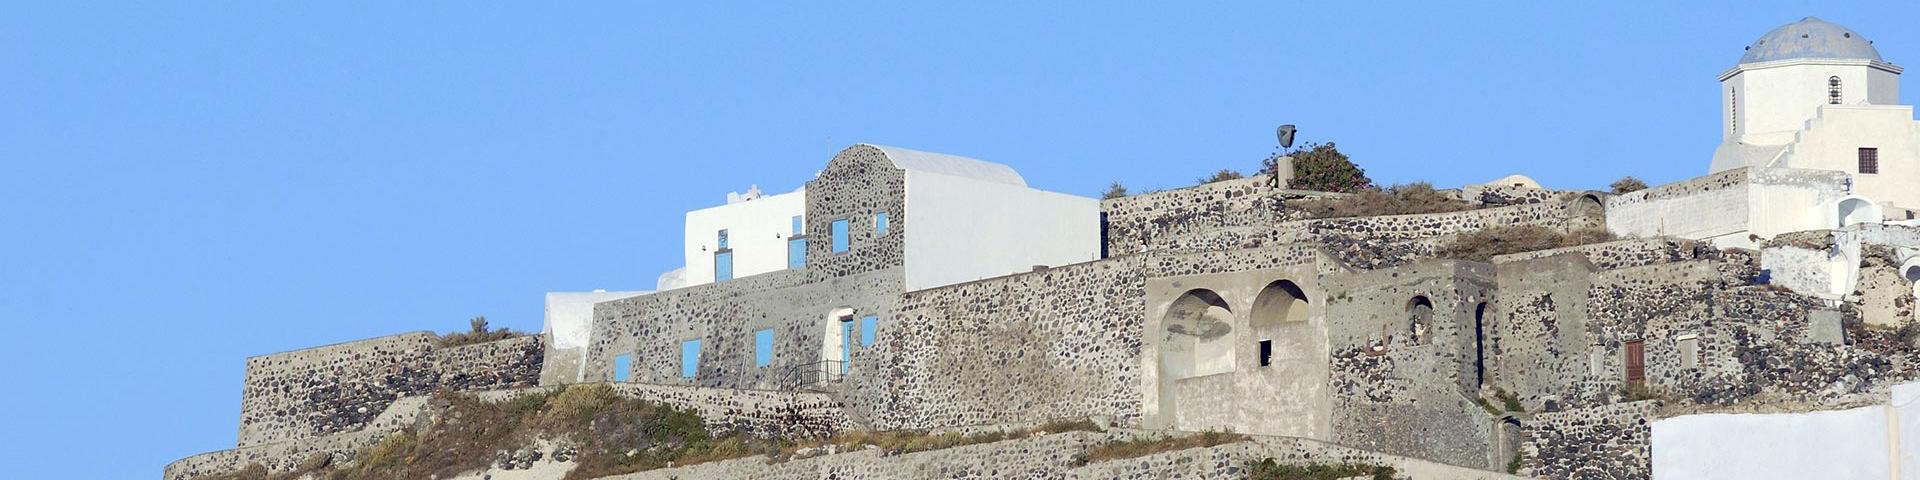 Santorini Castles